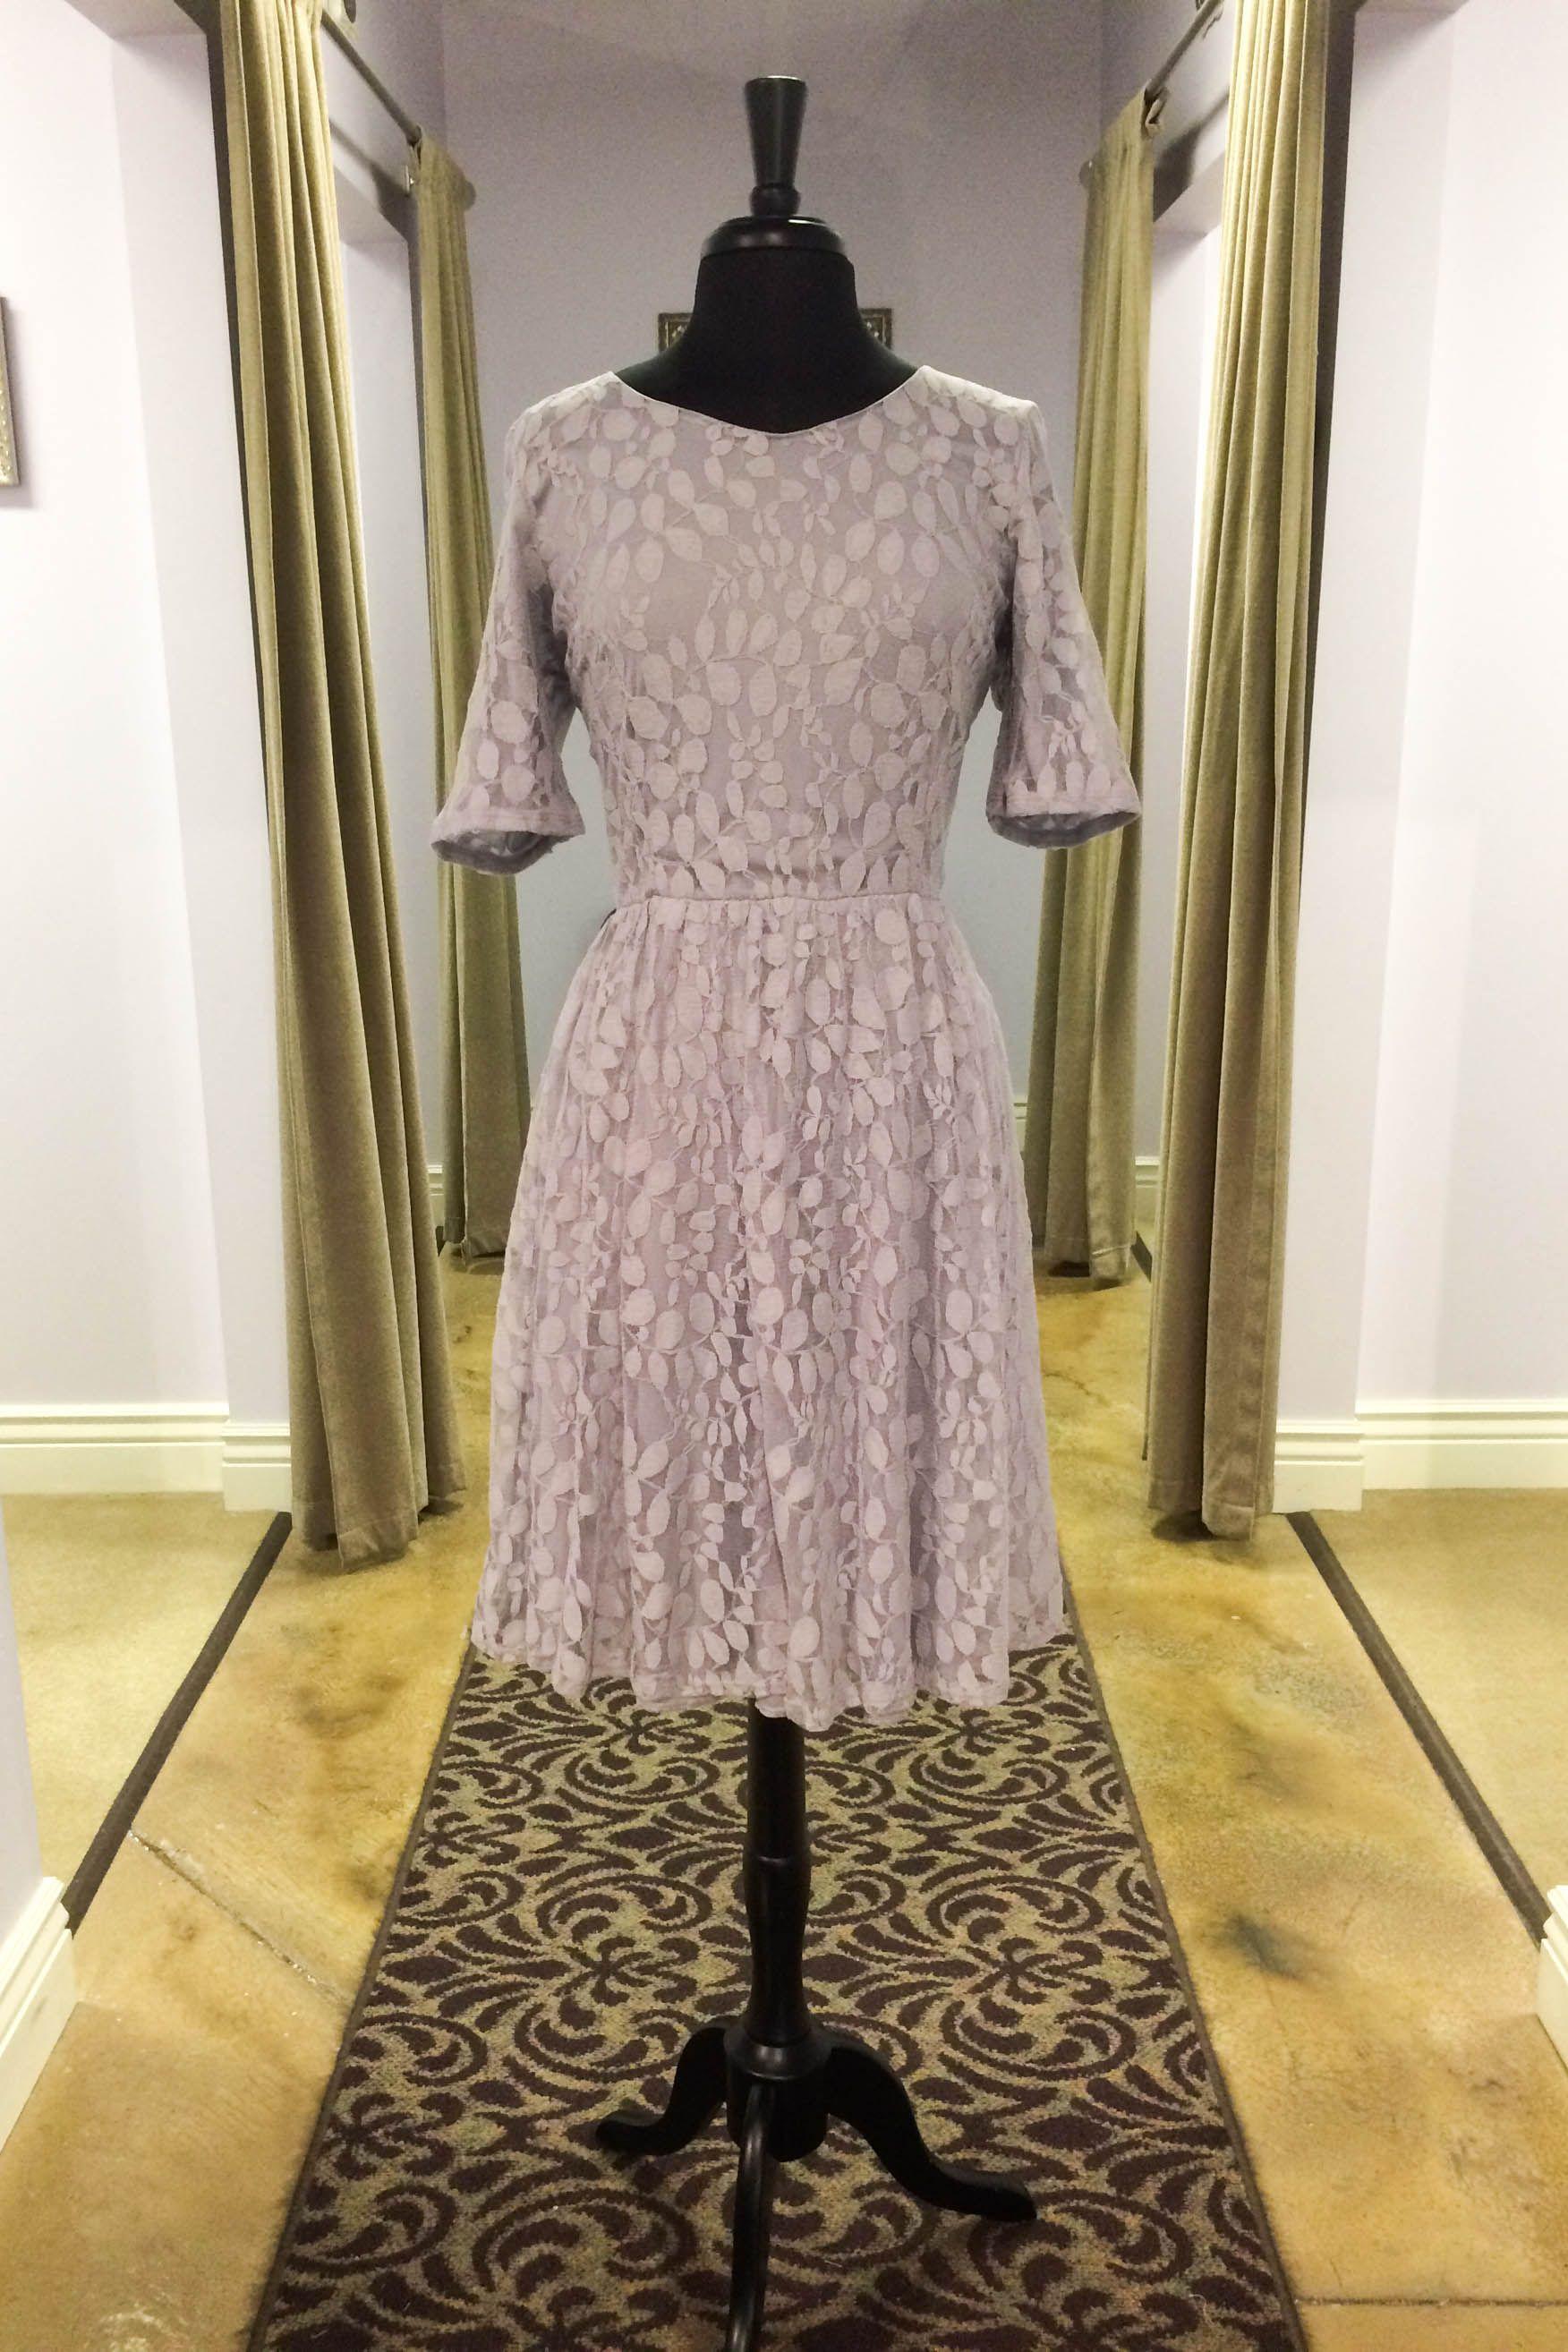 Lavender storm lace bridesmaid dress size 0 28w 65 2017 lavender storm lace bridesmaid dress size 0 28w 65 ombrellifo Image collections